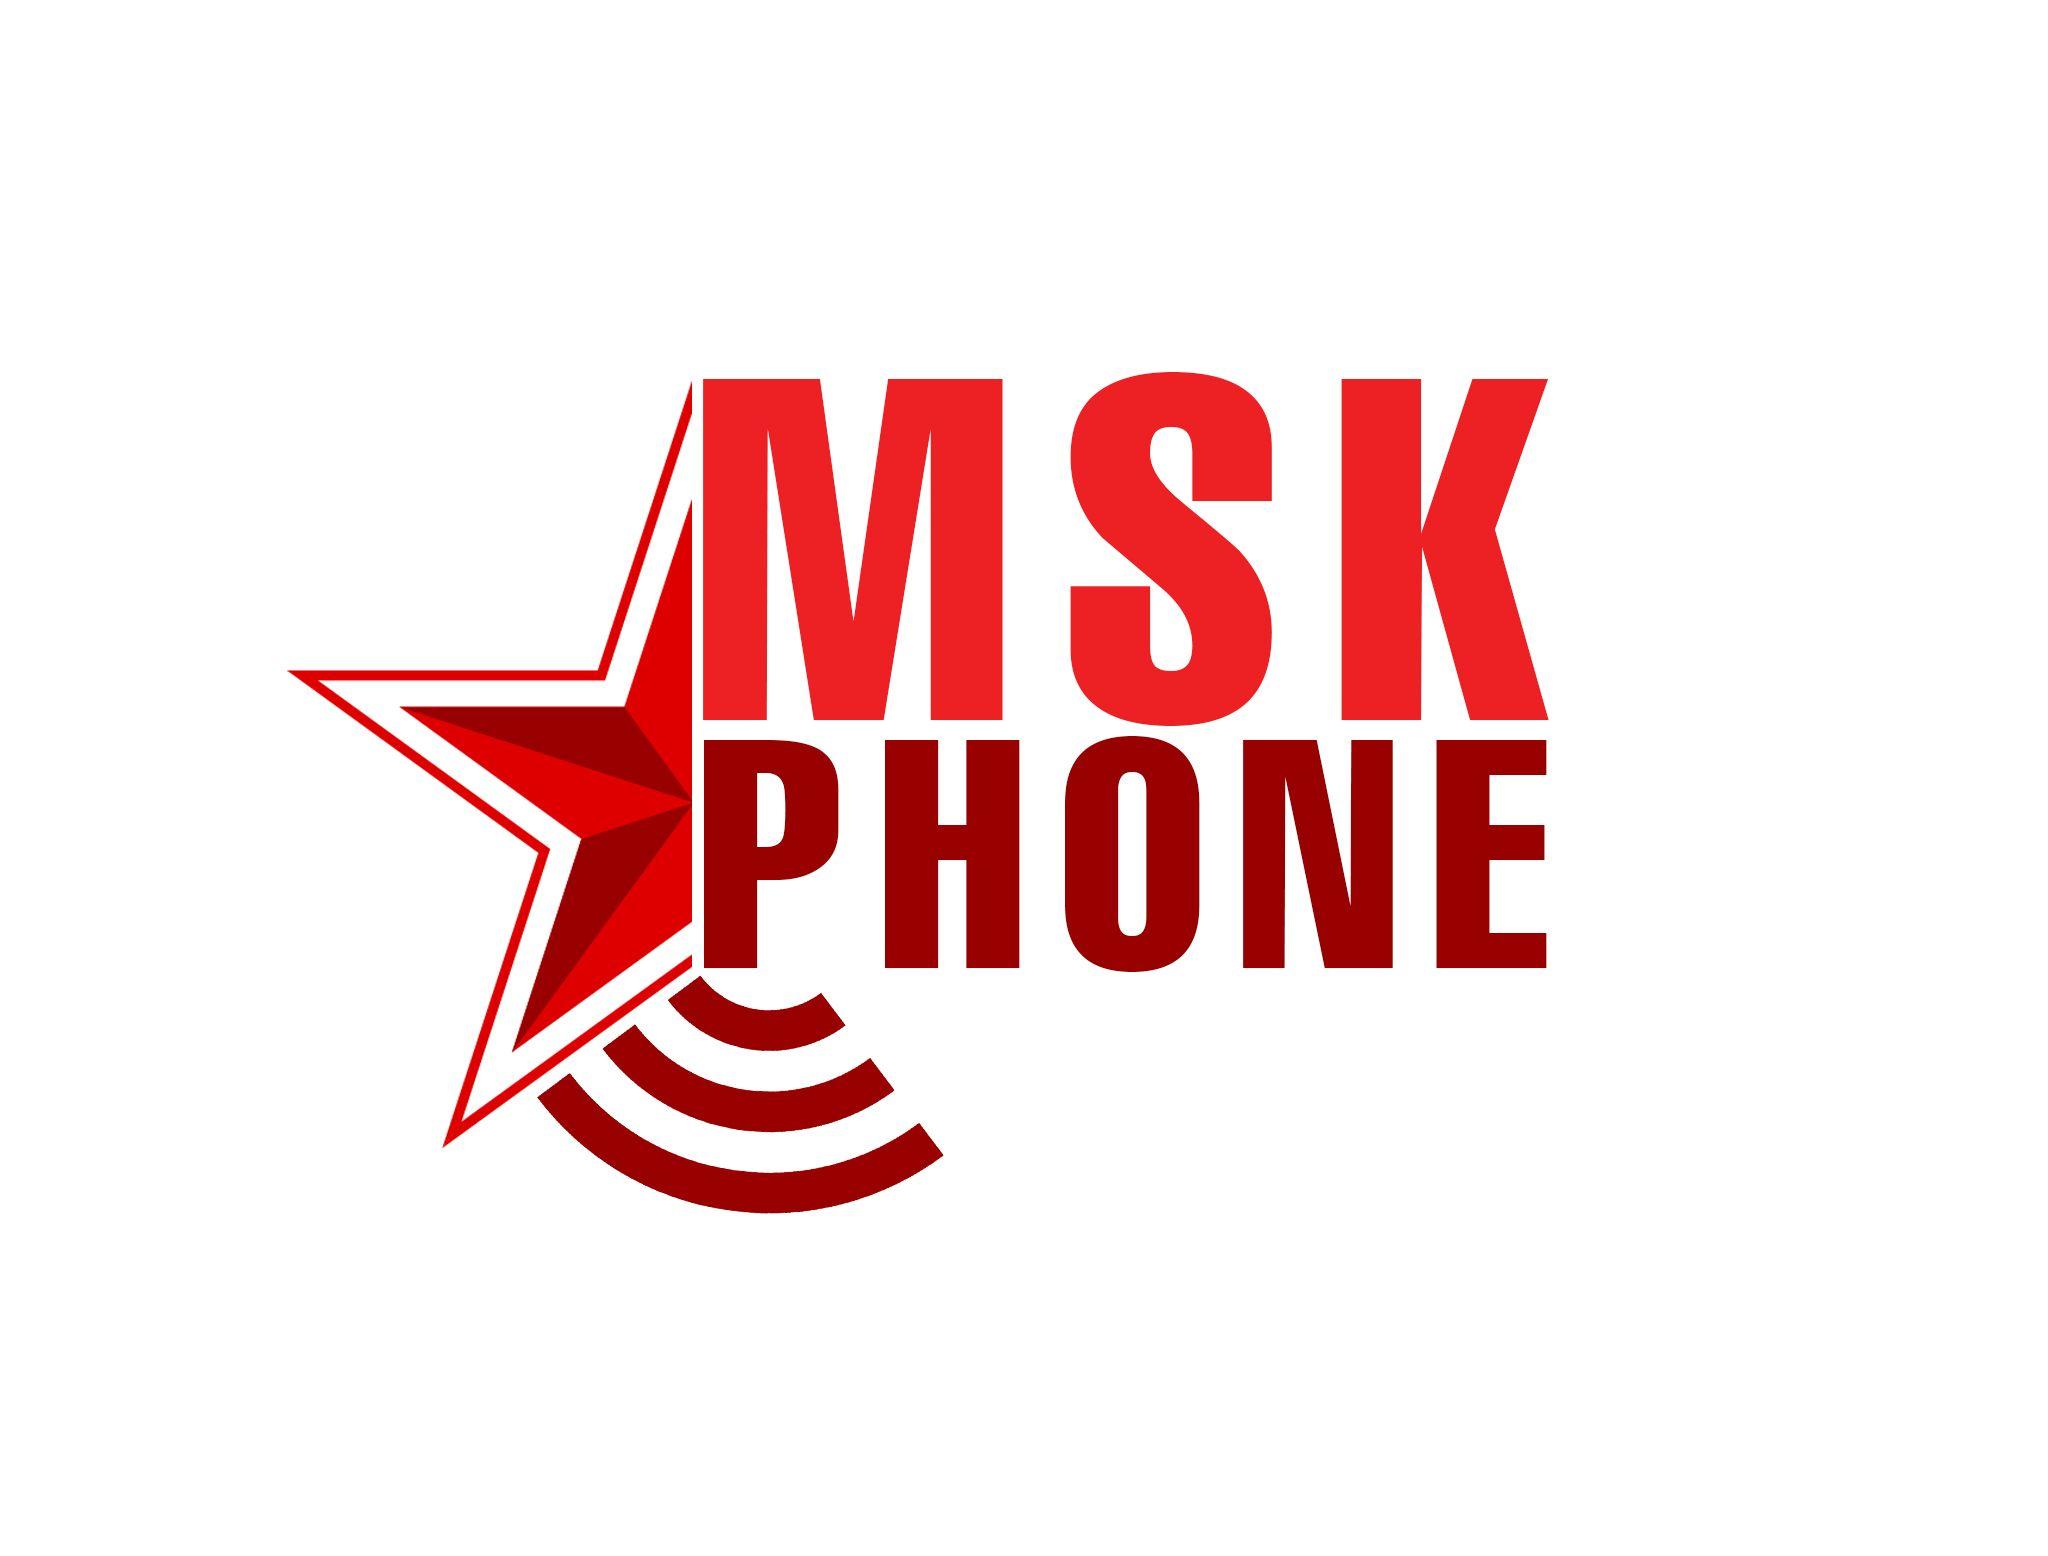 Логотип для MSKPHONE - дизайнер N_KARCHEVSKYI